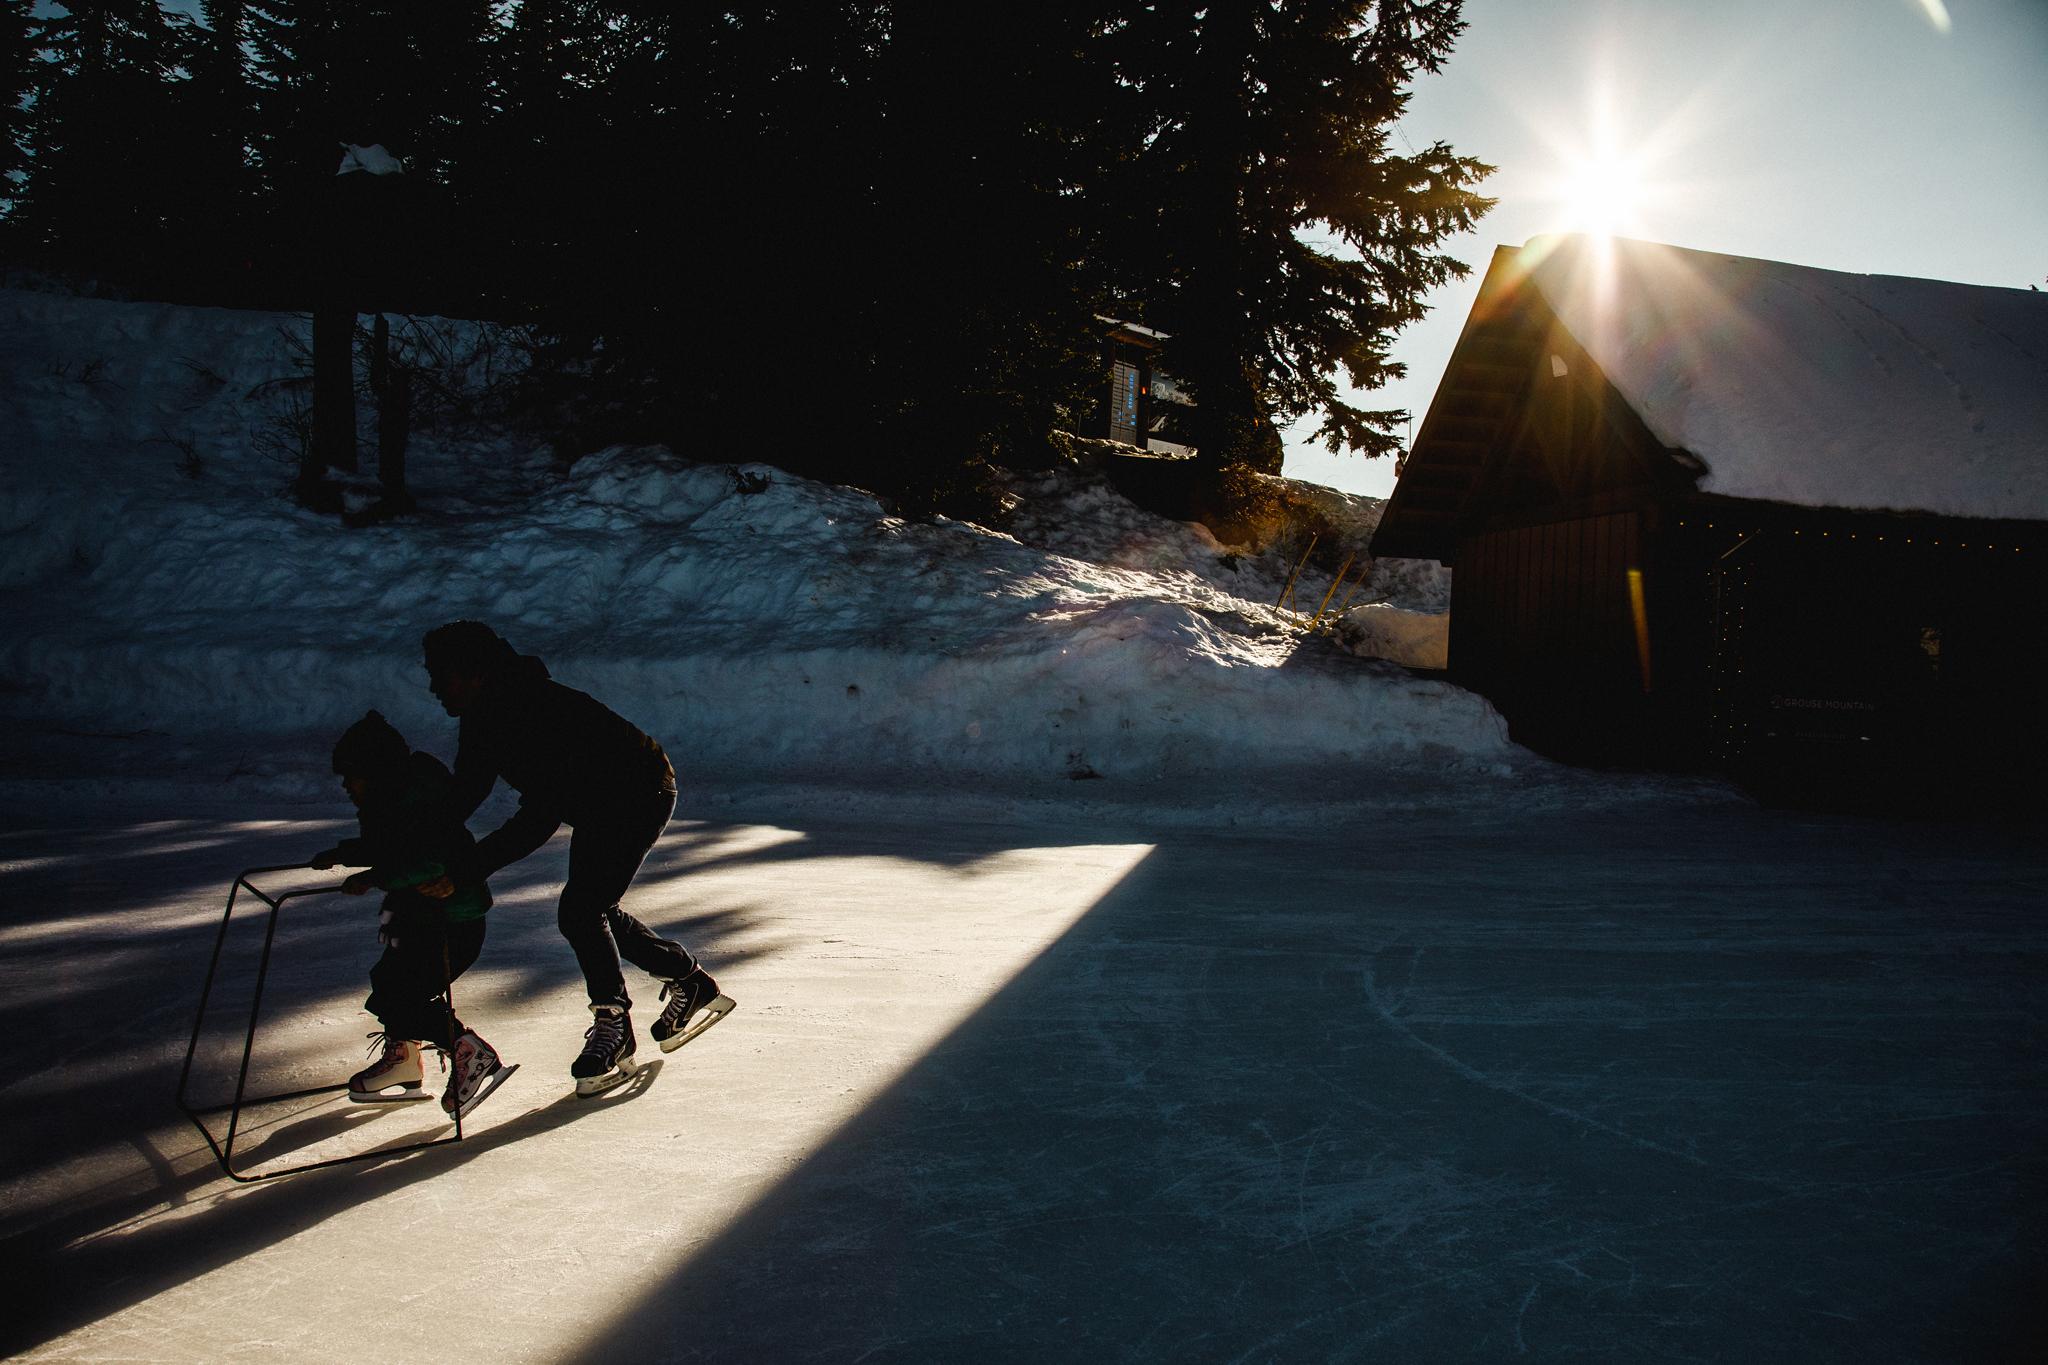 felicia derek skating-1.jpg